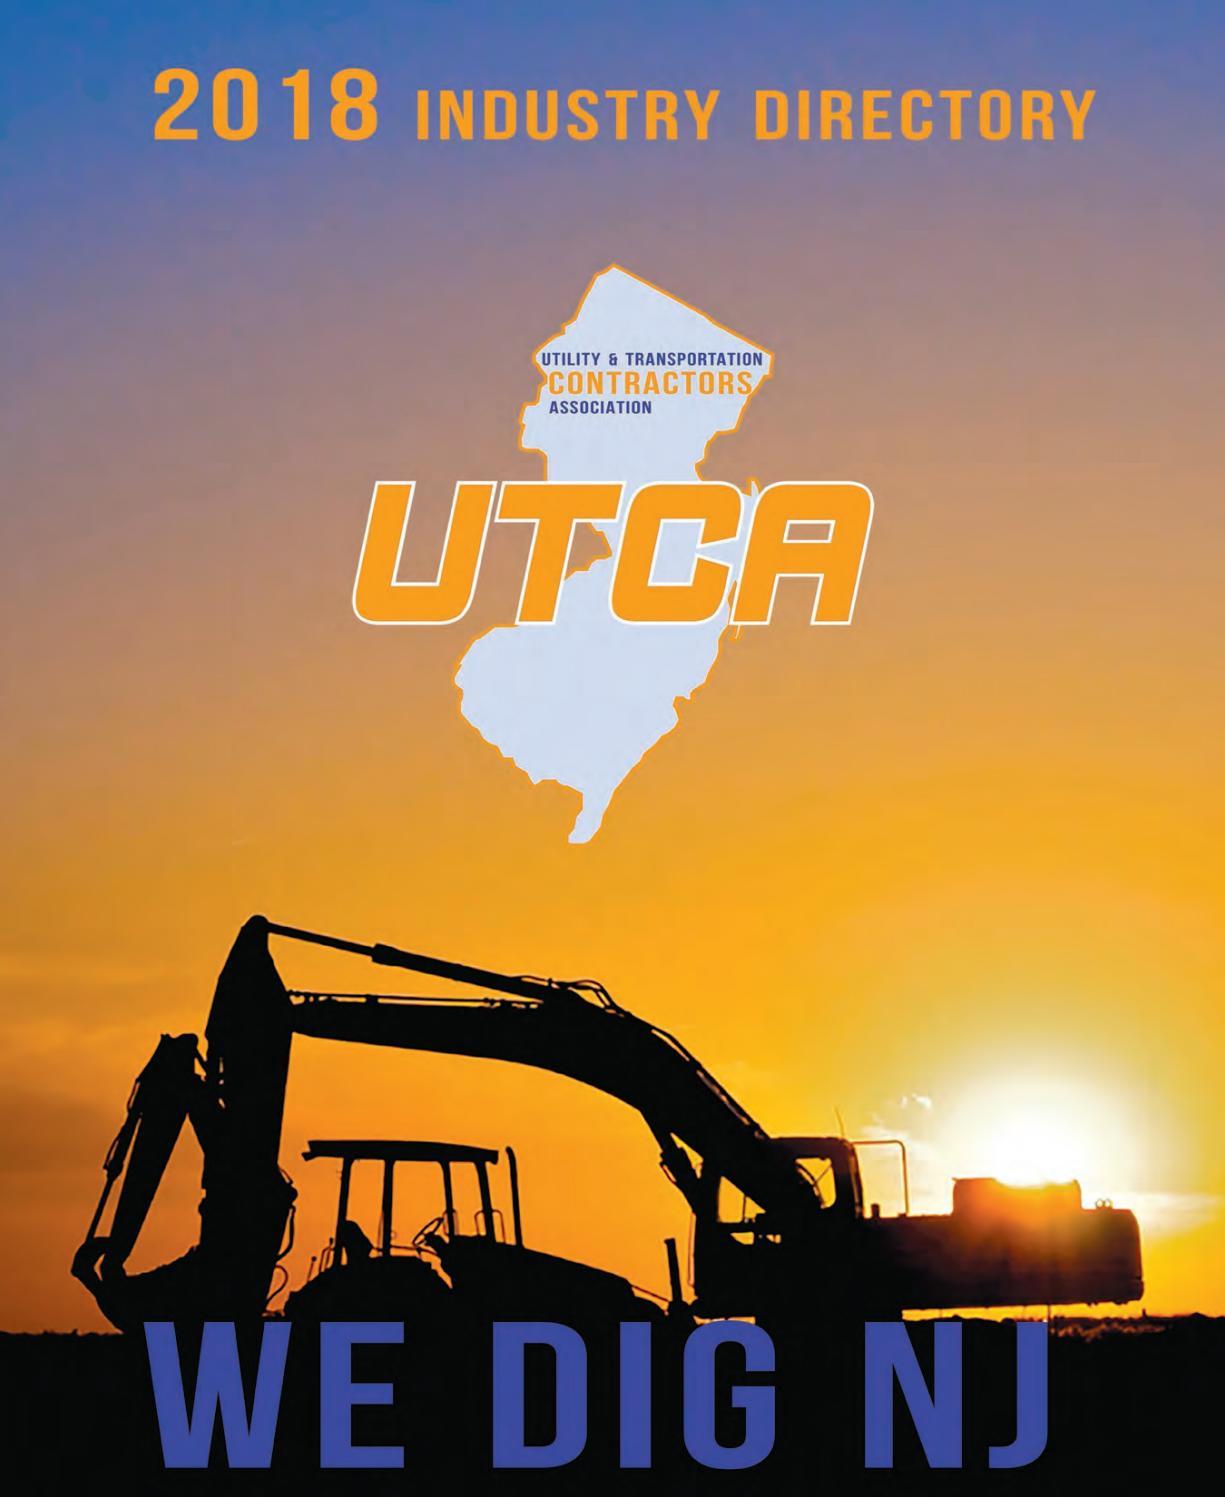 UTCA 2018 Industry Directory by UTCA - issuu